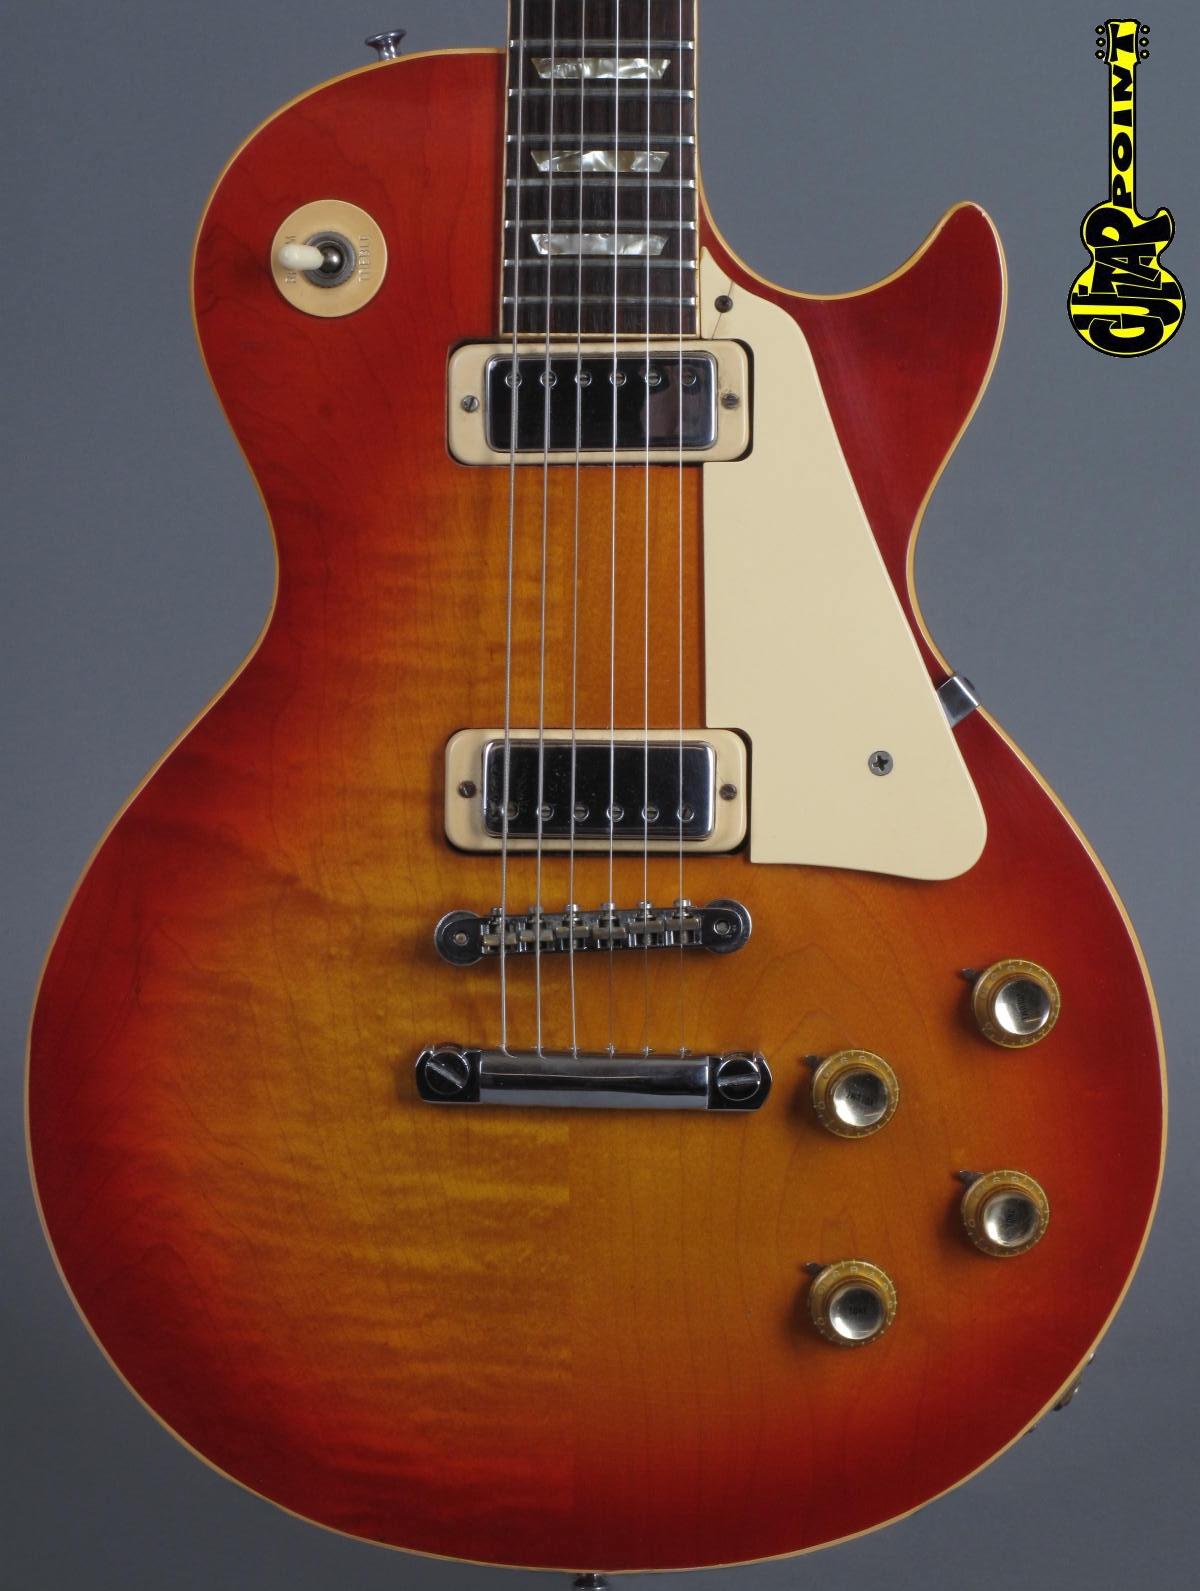 1974 Gibson Les Paul Deluxe - Cherry Sunburst / 2-piece top, flames + lightweight !